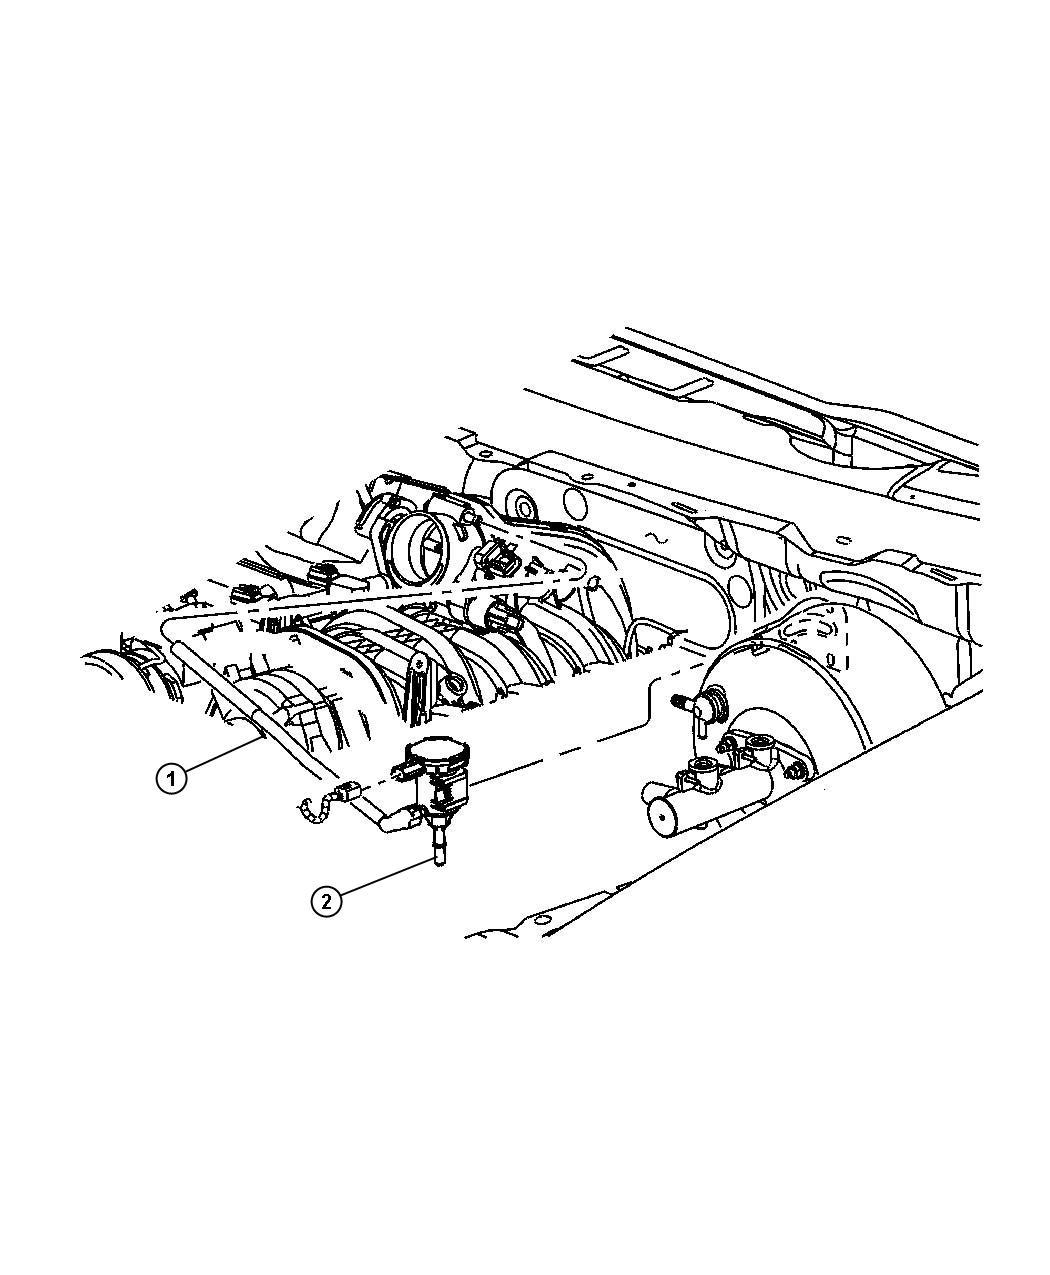 Dodge Durango Valve Linear Purge Without Bracket Vacuum